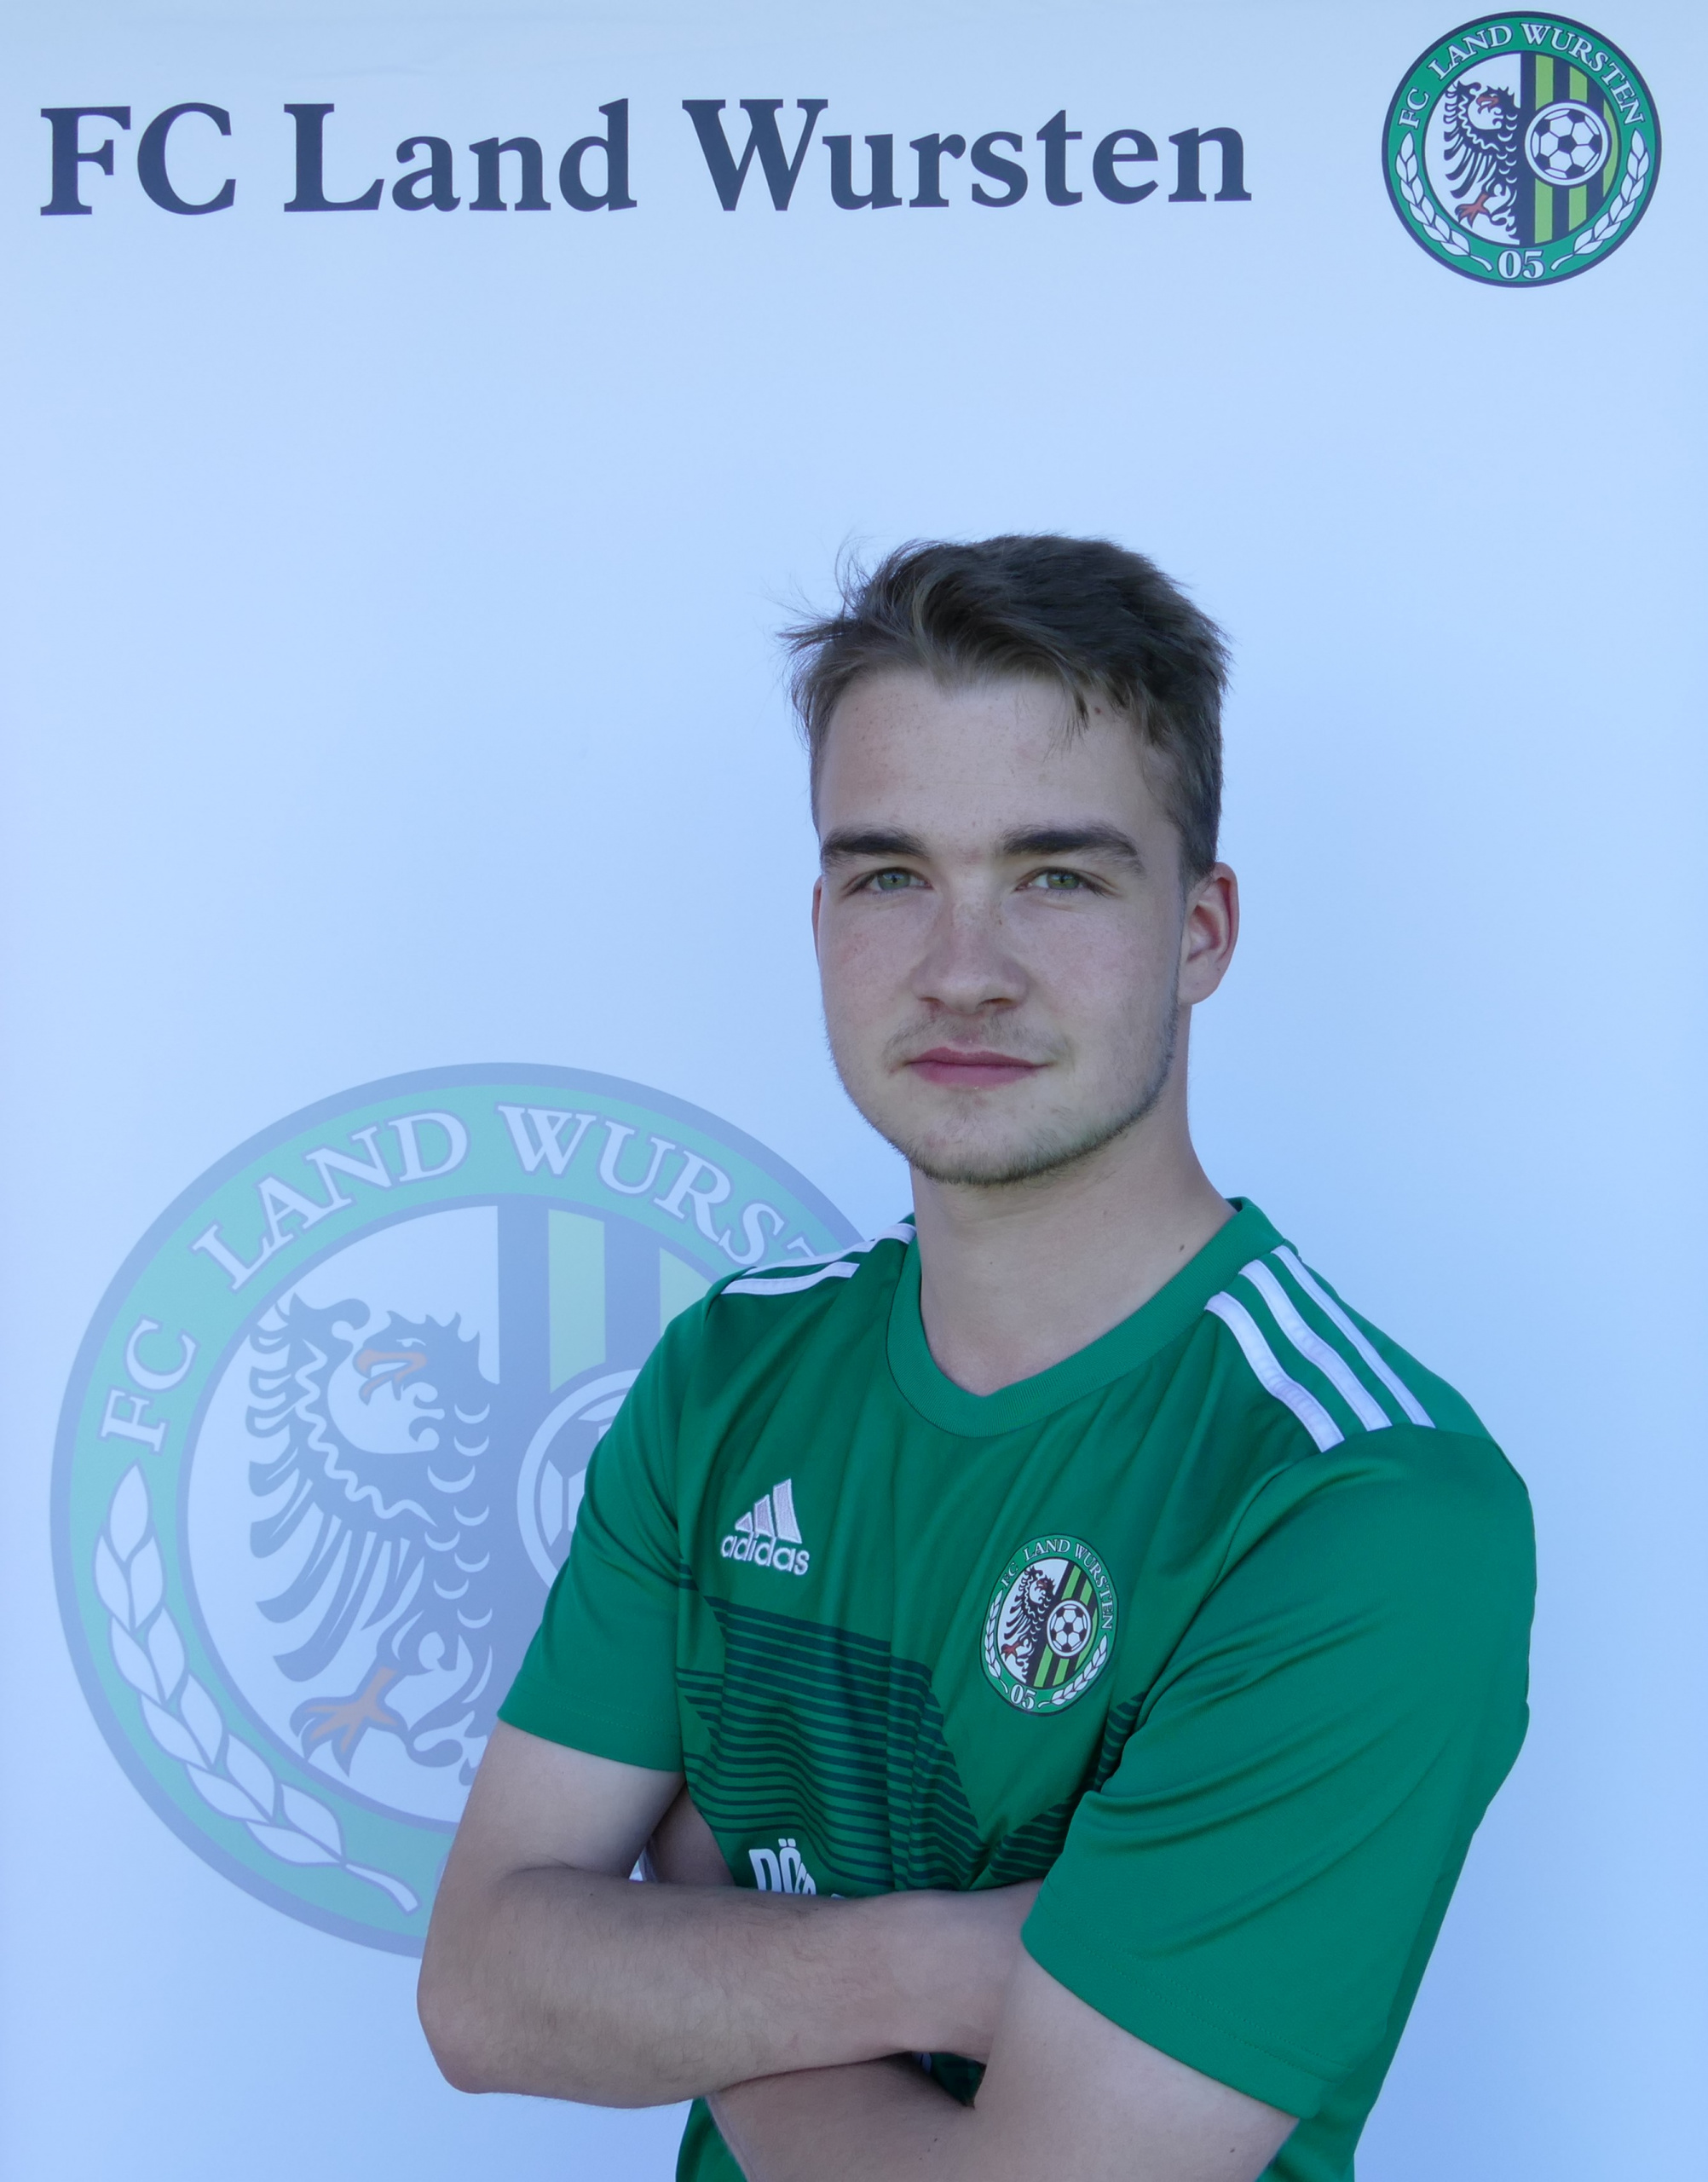 FC Land Wursten holt Florian Lange vom SV Komet Pennigbüttel